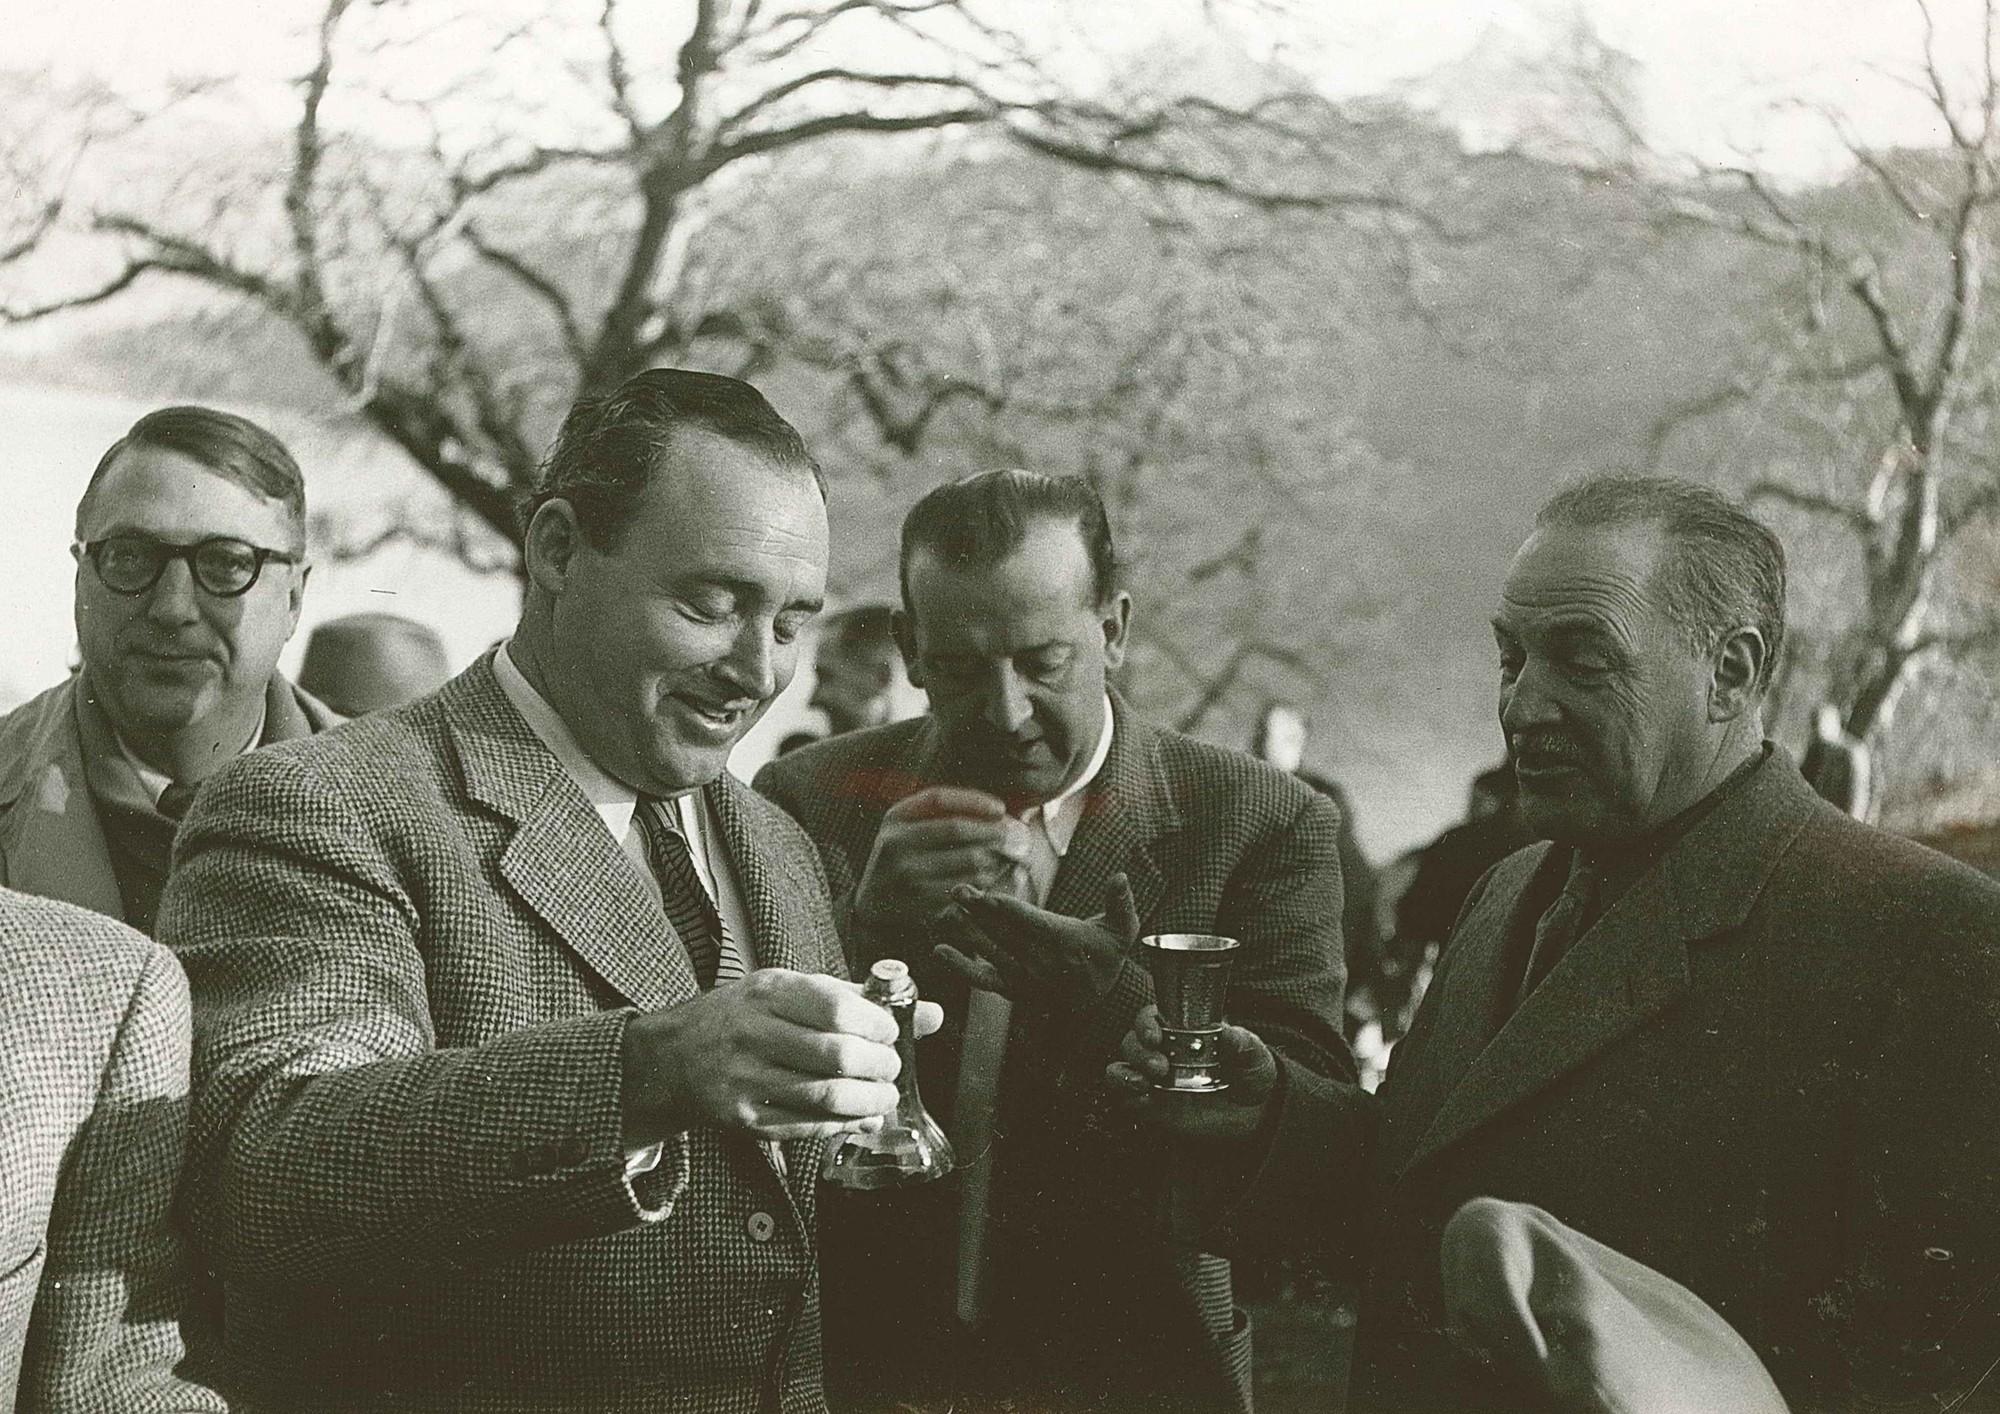 Rütli 1952 v.l. Dr. Adelbert Eckstein, Kurt Girard, Rudolf Bürgin, Dr.h.c. Heinrich Küng